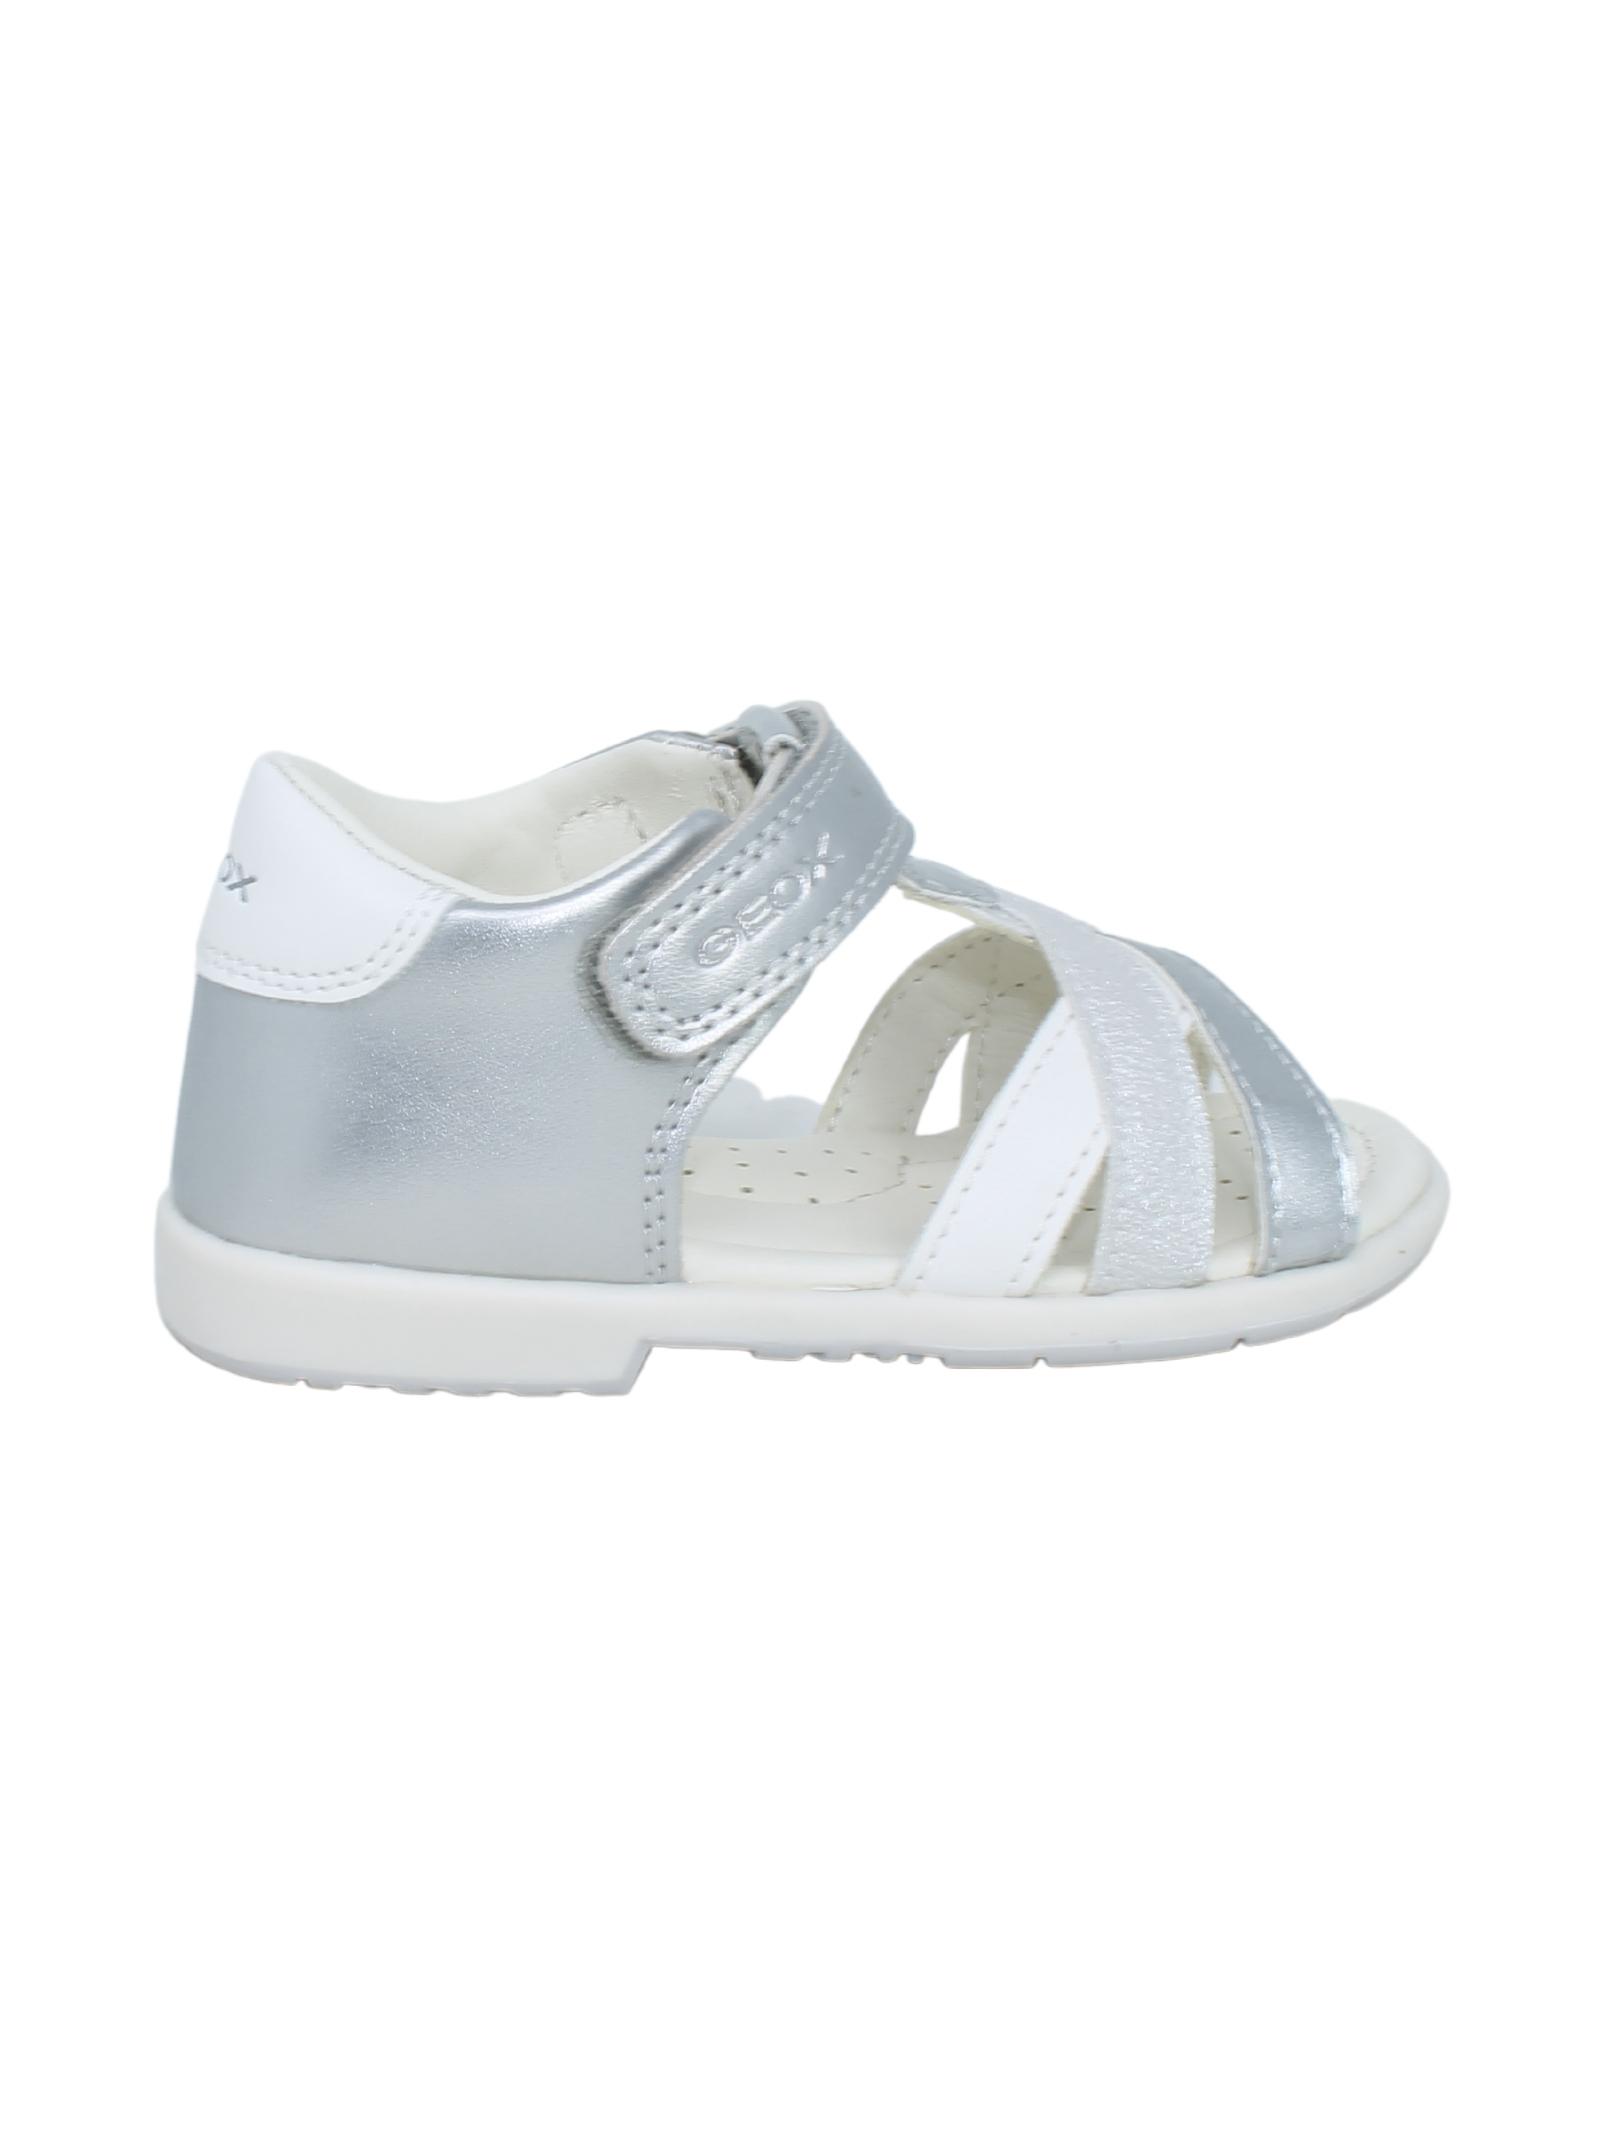 Sandalo Bambina Verred GEOX KIDS | Sandali | B1521B0NFBJC1303